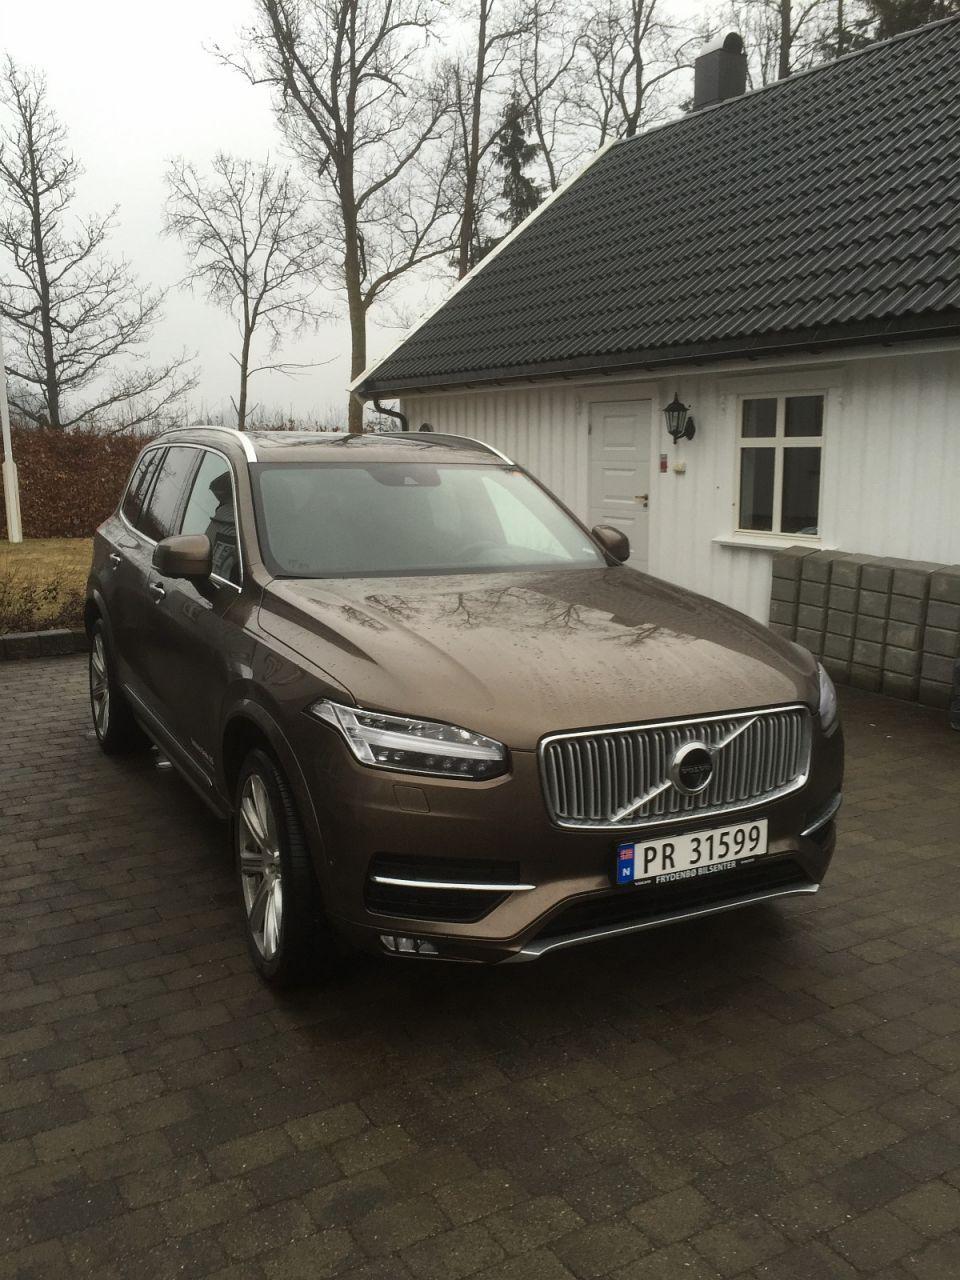 Best 25+ Volvo convertible ideas on Pinterest | Volvo ...